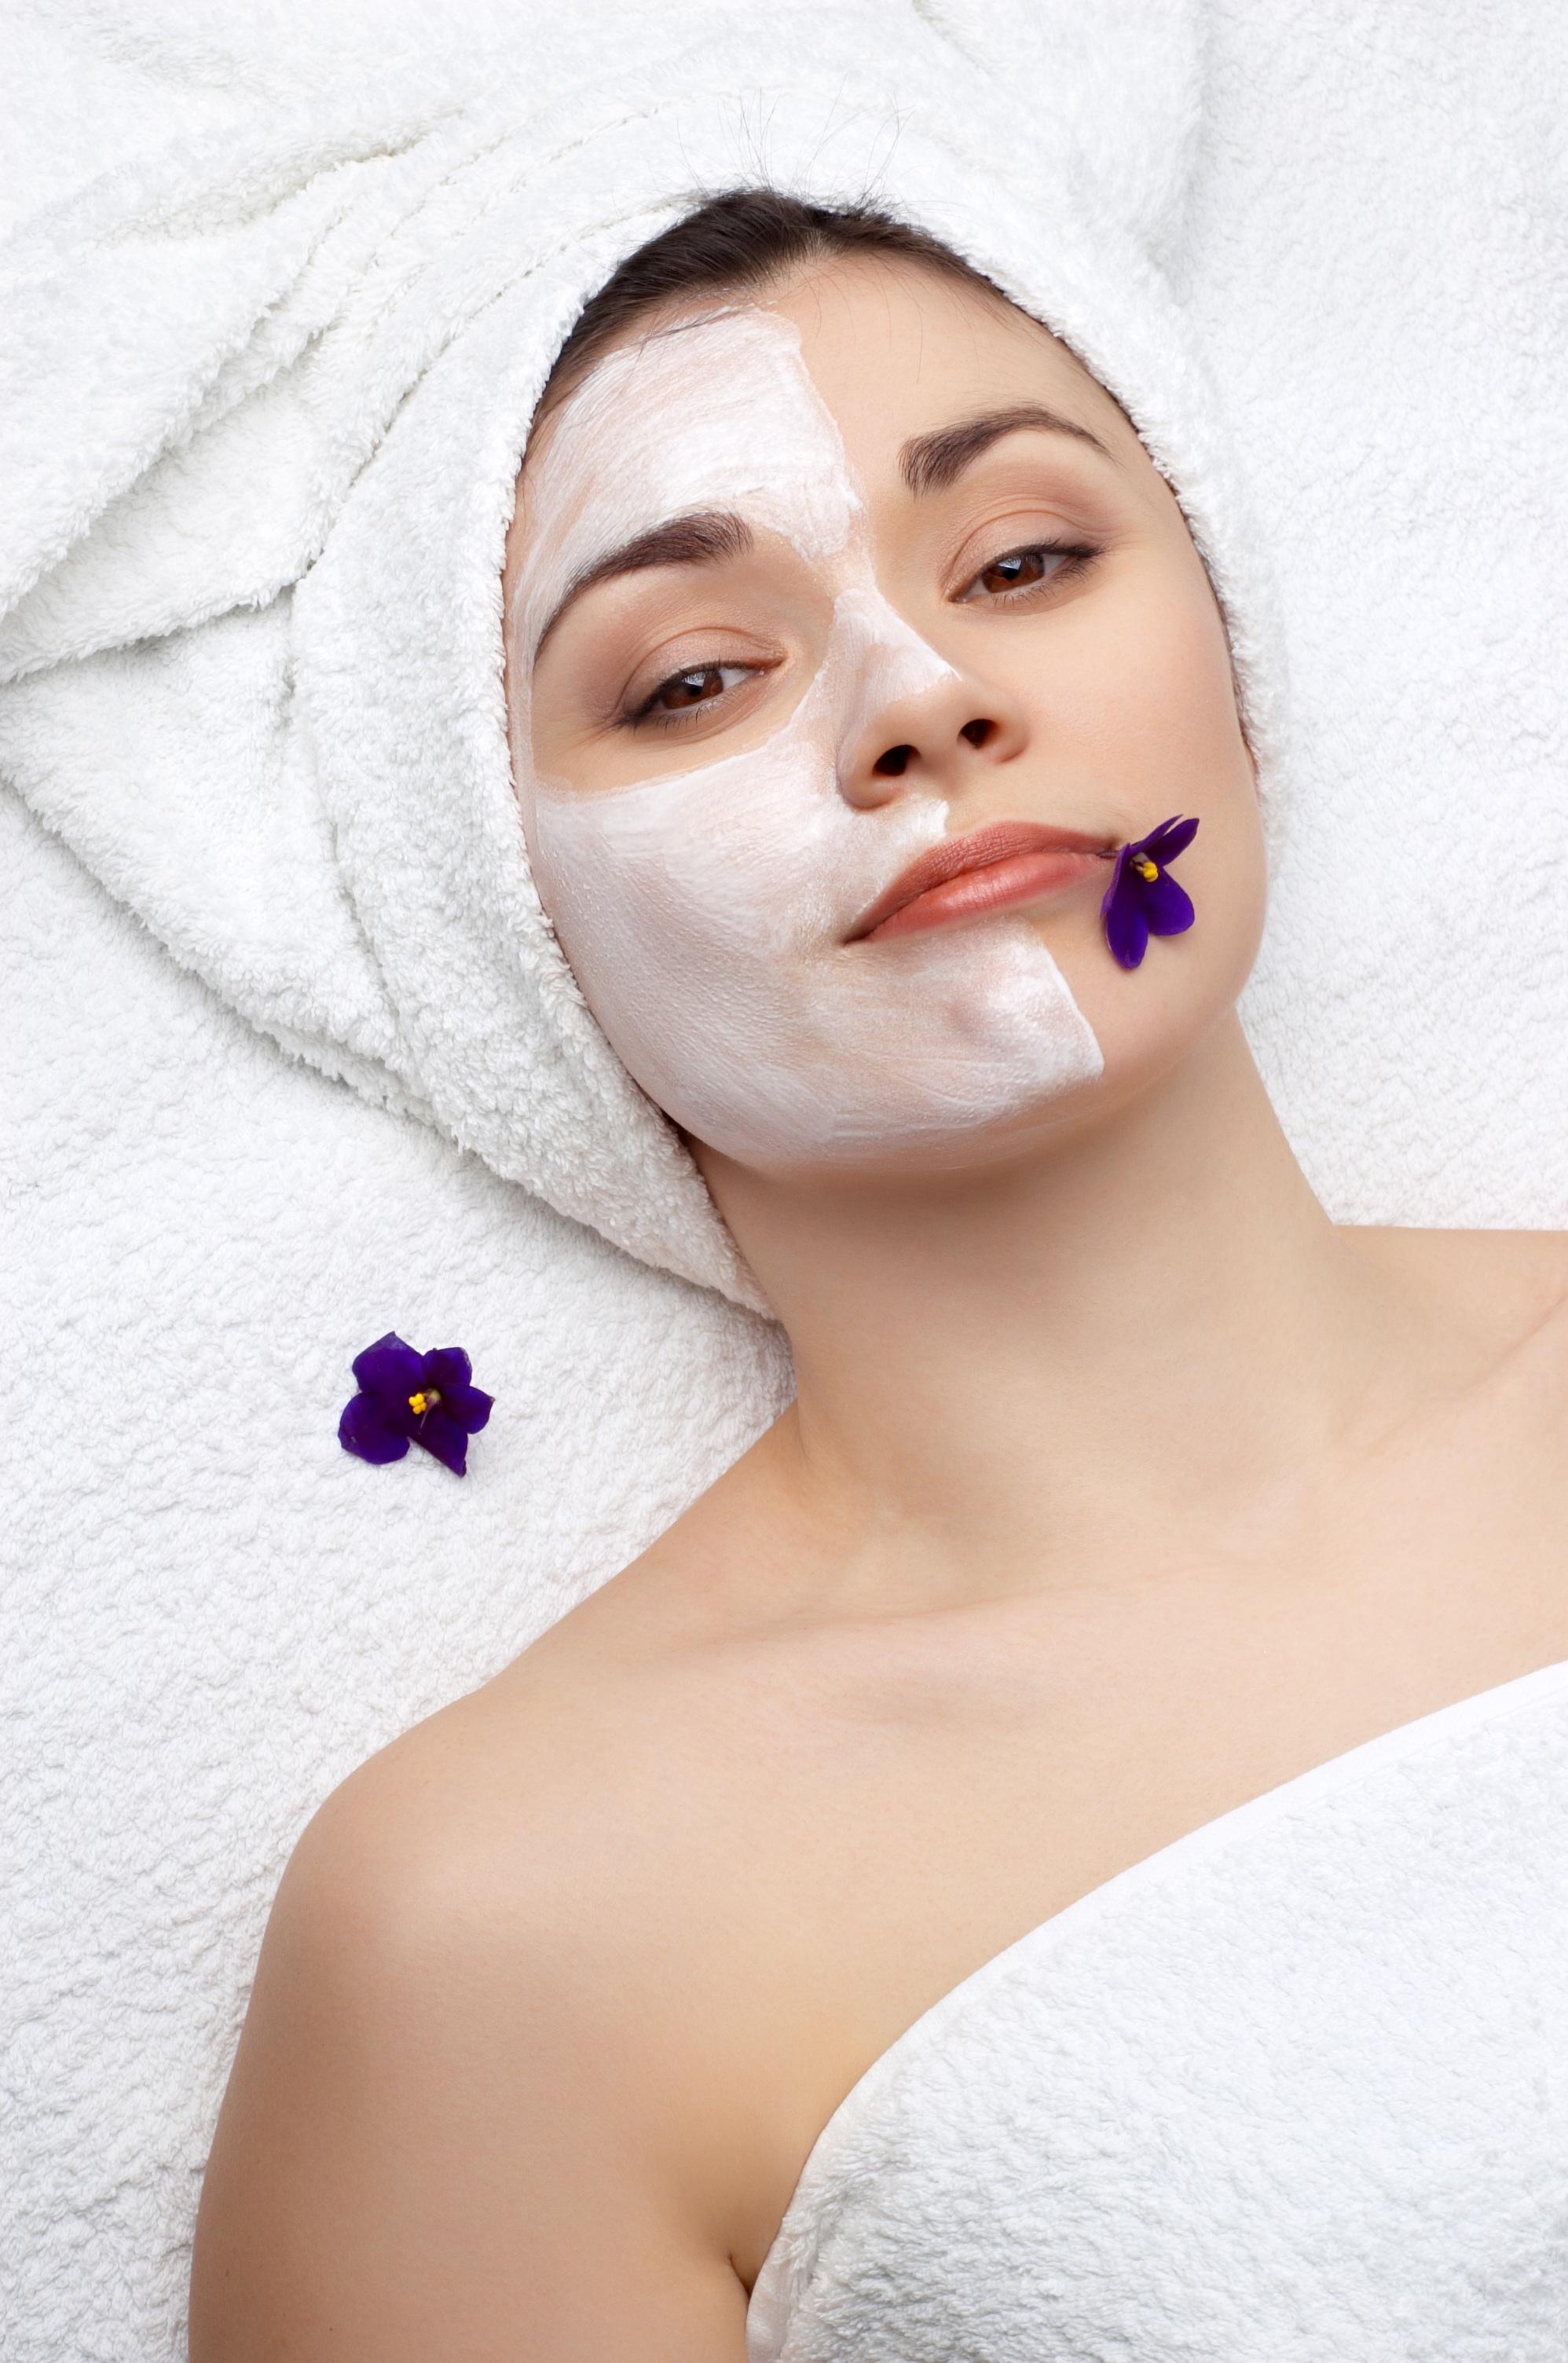 beauty salon series: facial mask